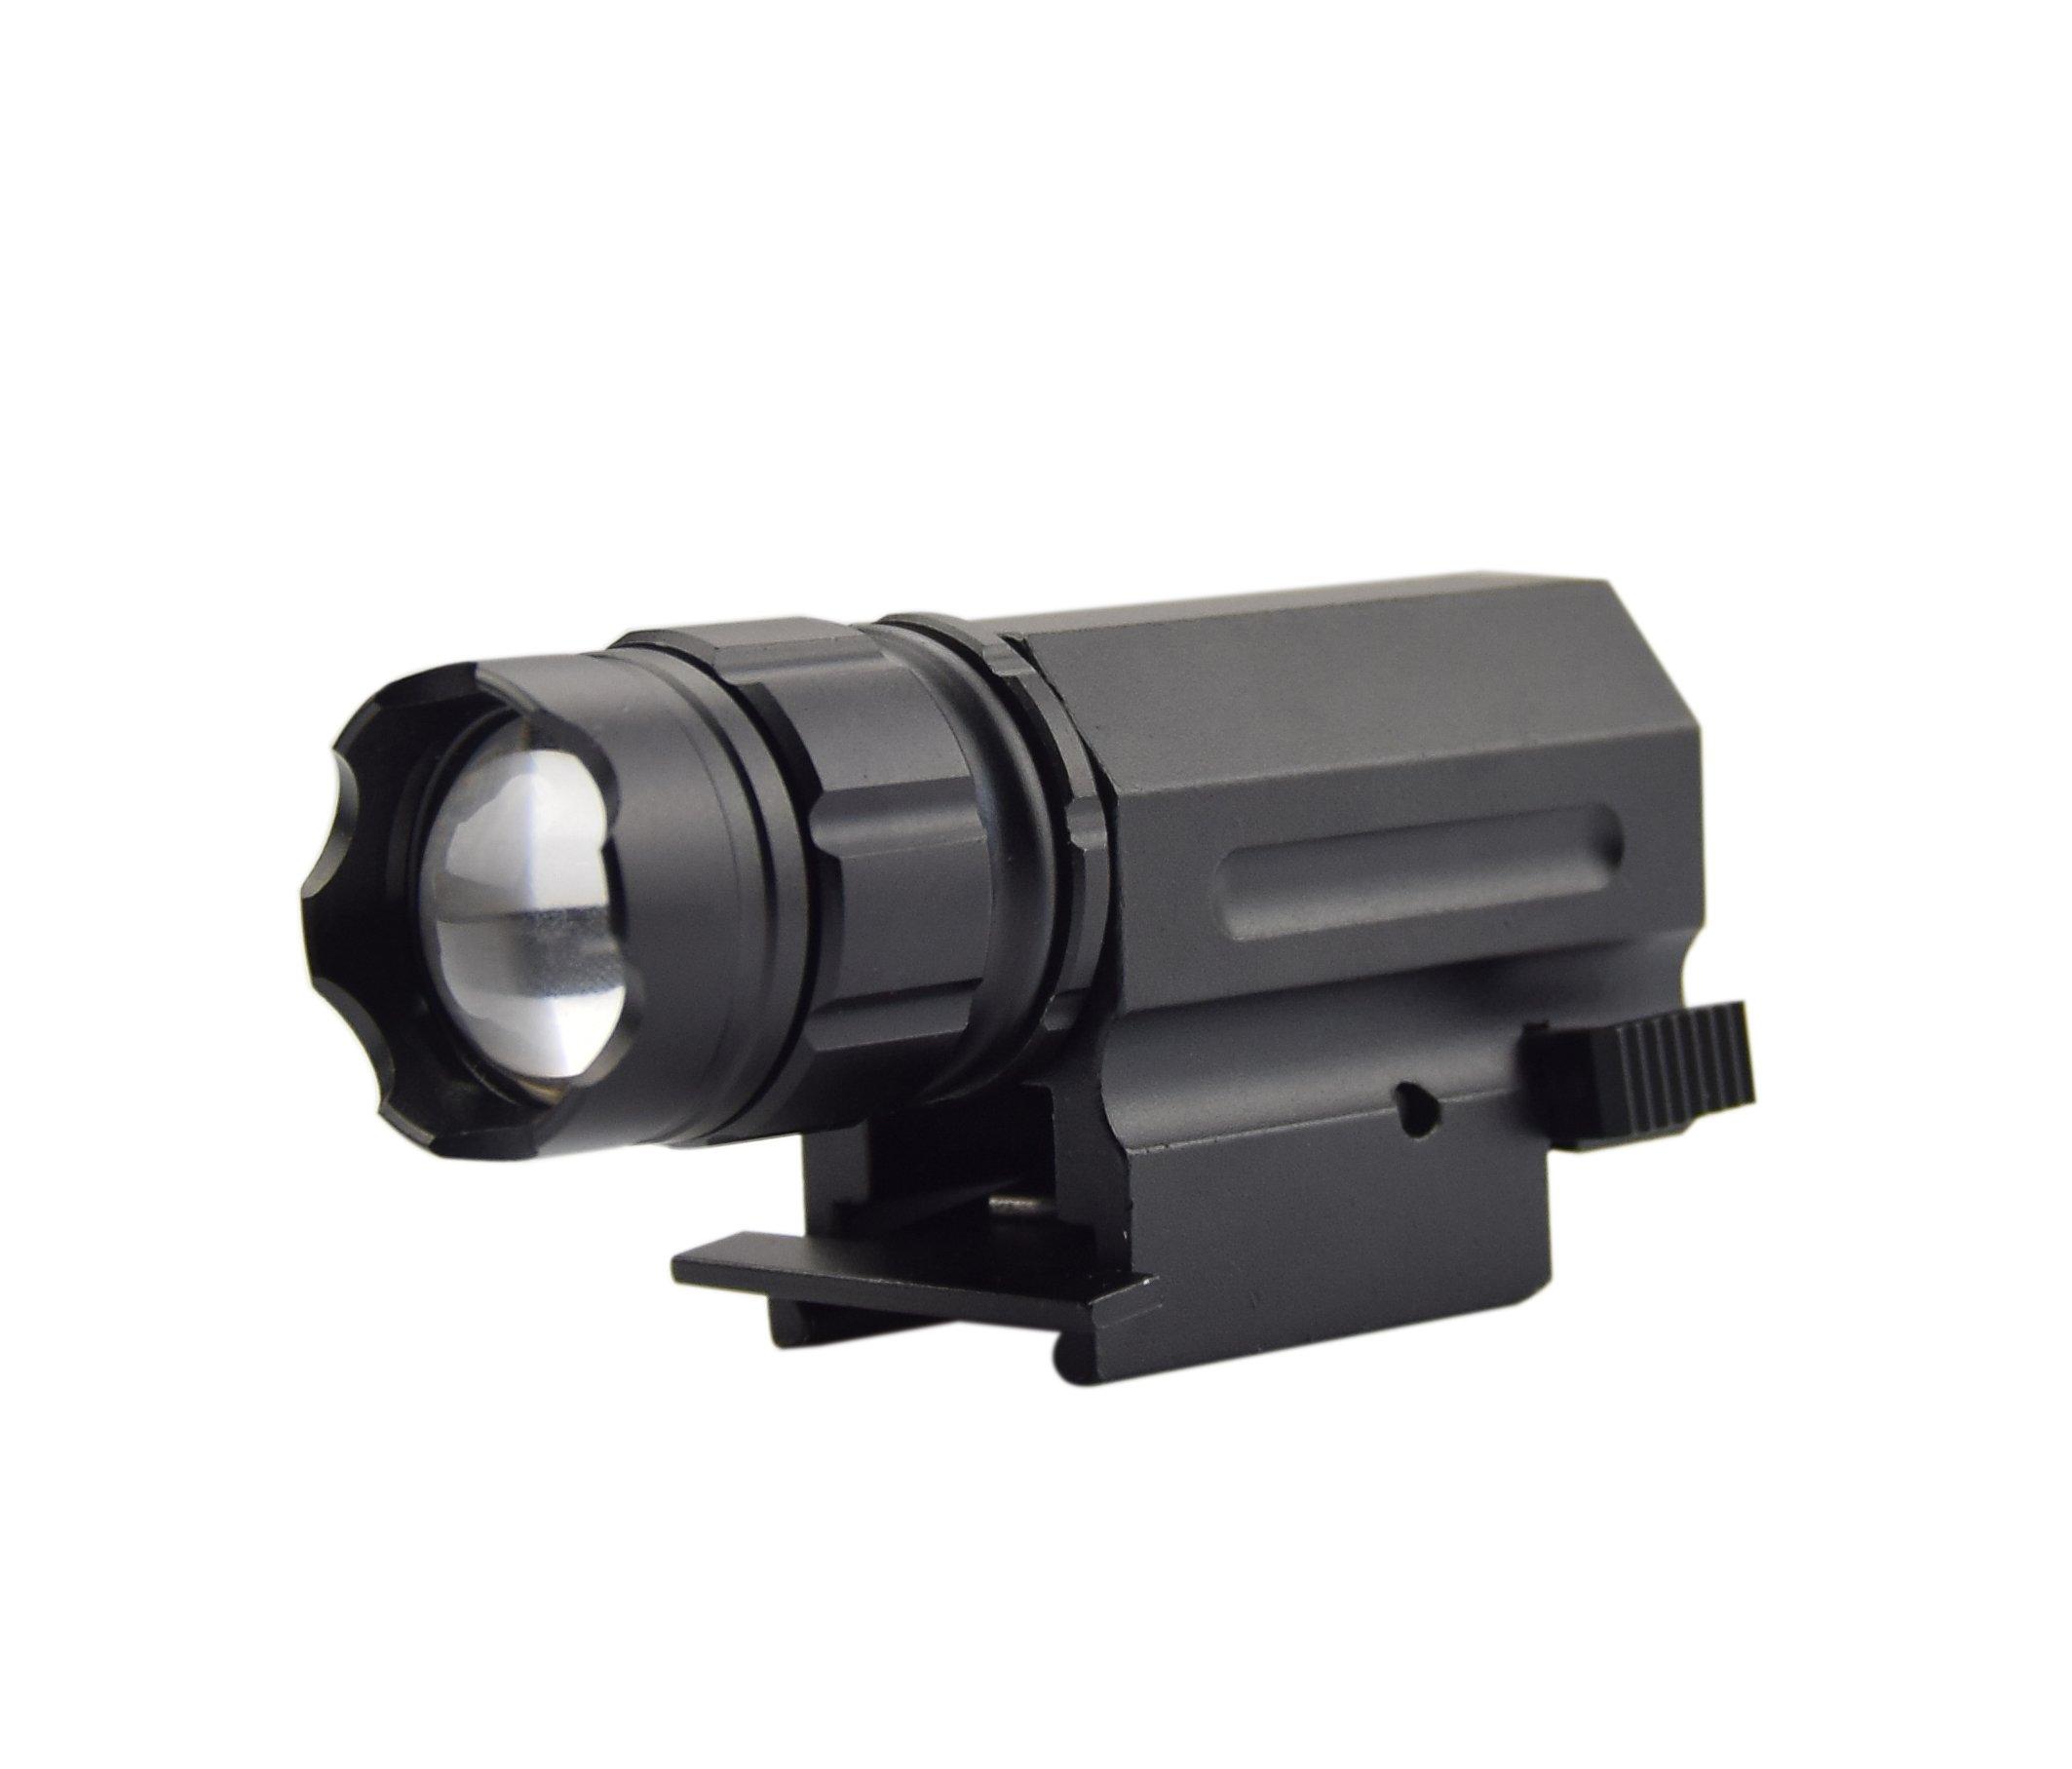 Feyachi 220 Lumen Tatical Weaver Mount Pistol/Rifle LED Flashlight Quick Release For 20mm Picatinny Rail